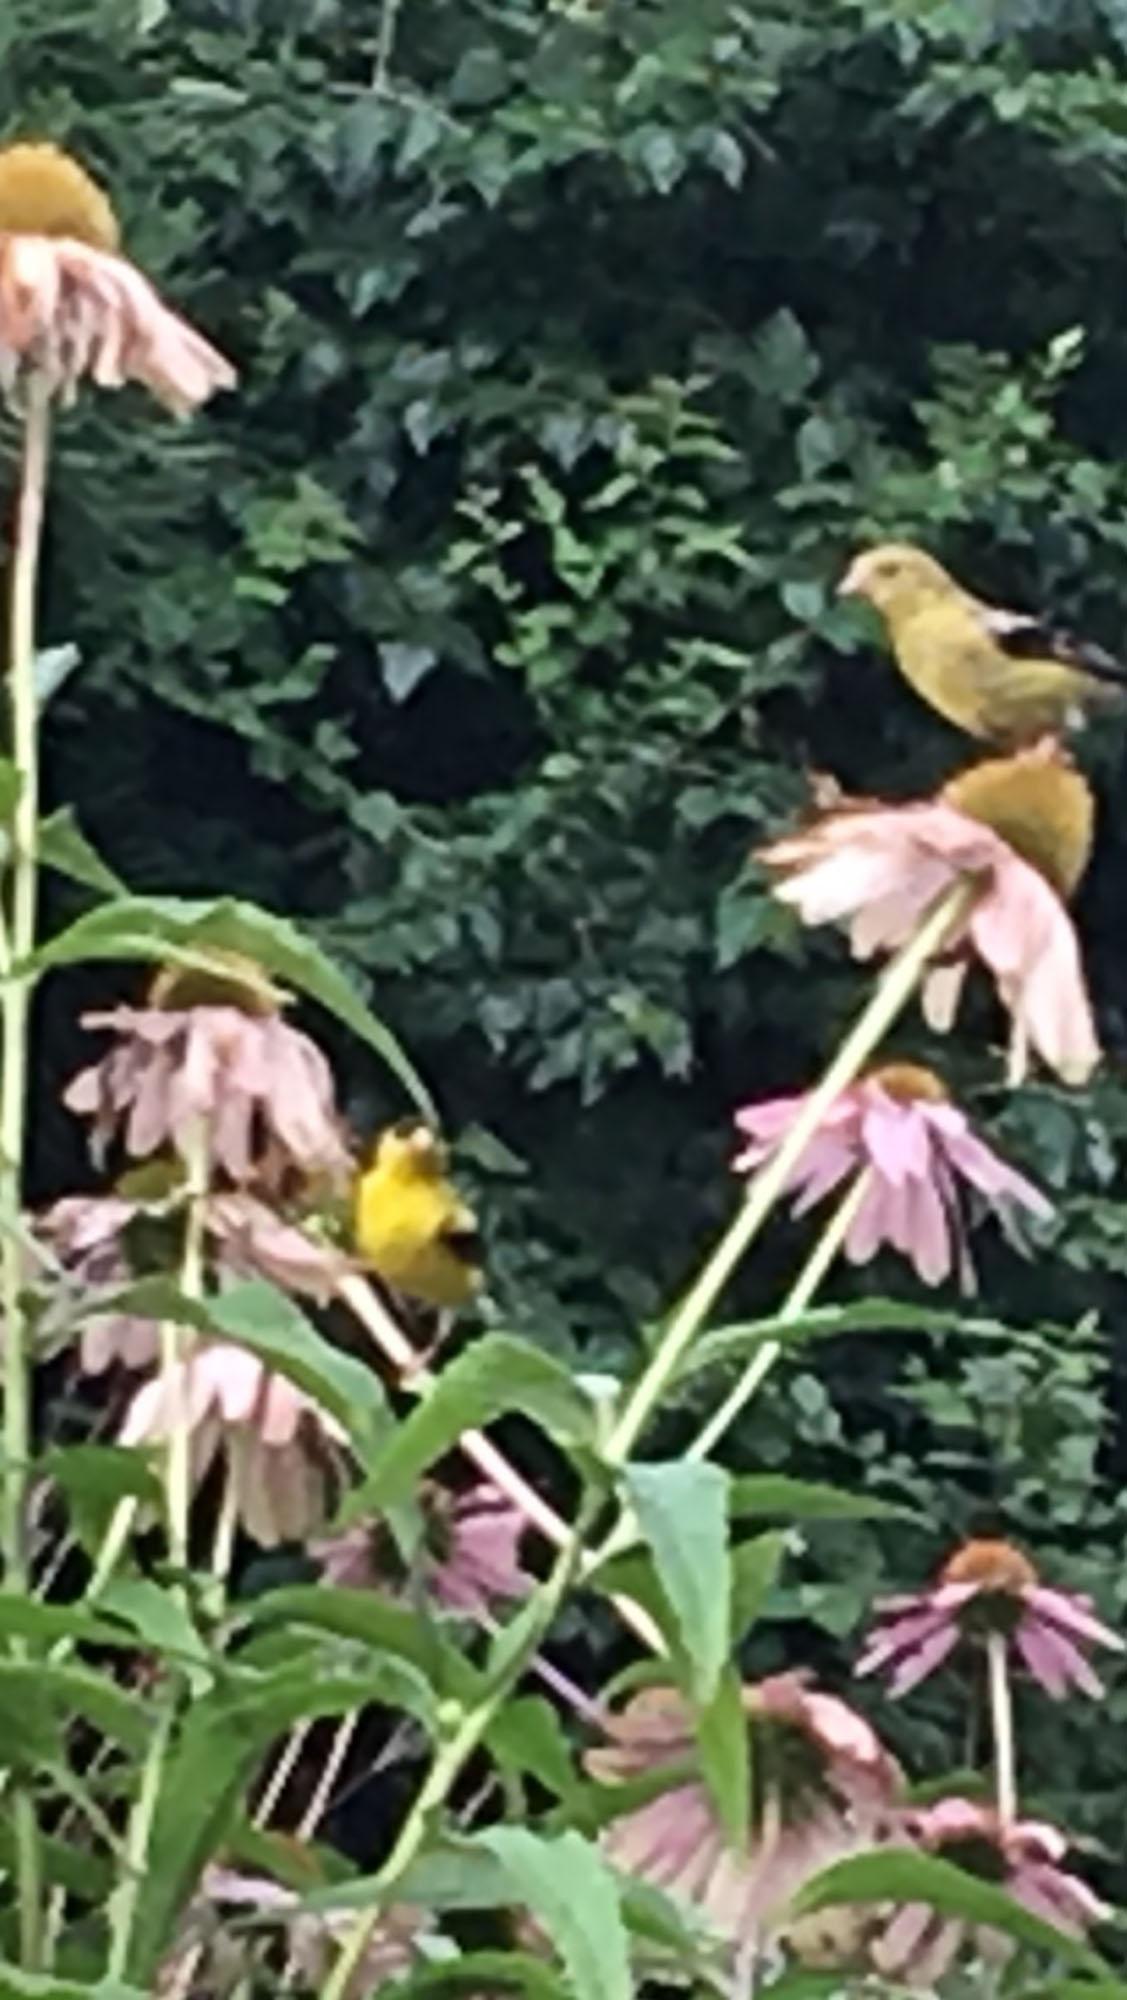 8-16 w-wildlife-yellow finch Memenger.jpg